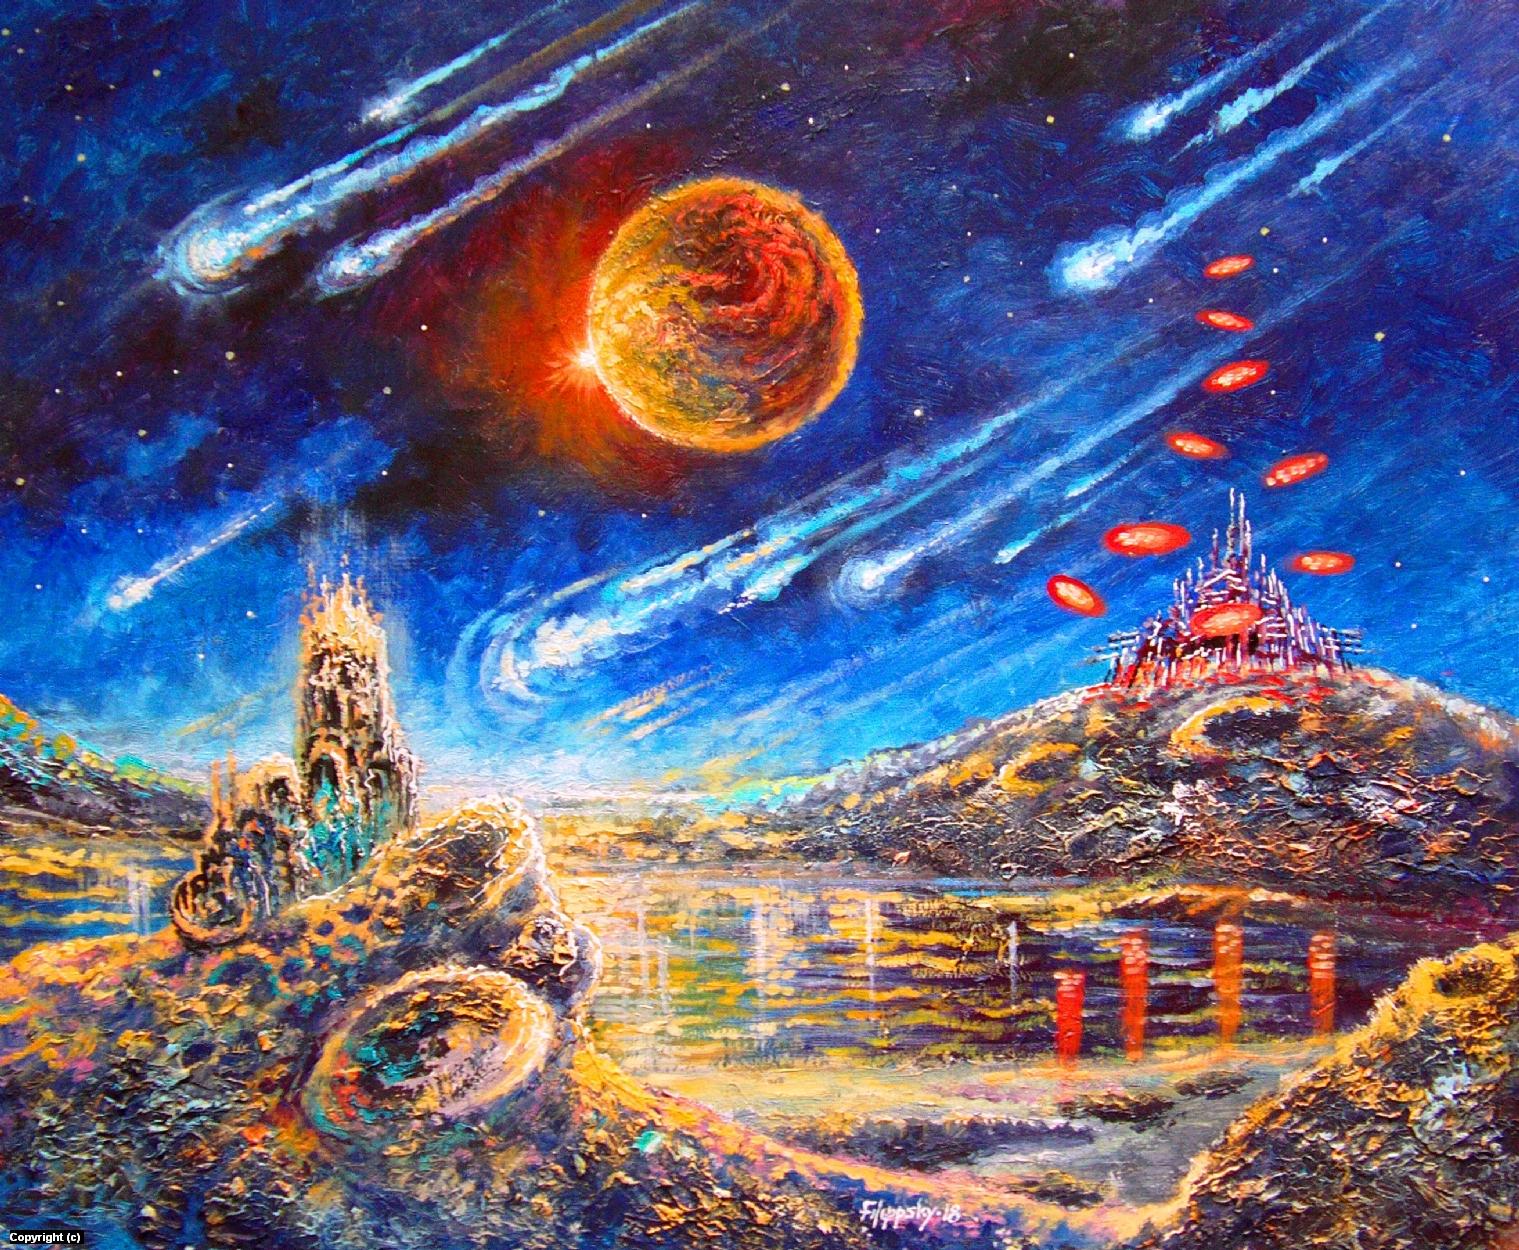 29 век.Терраформирование Луны. Artwork by Victor Filippsky